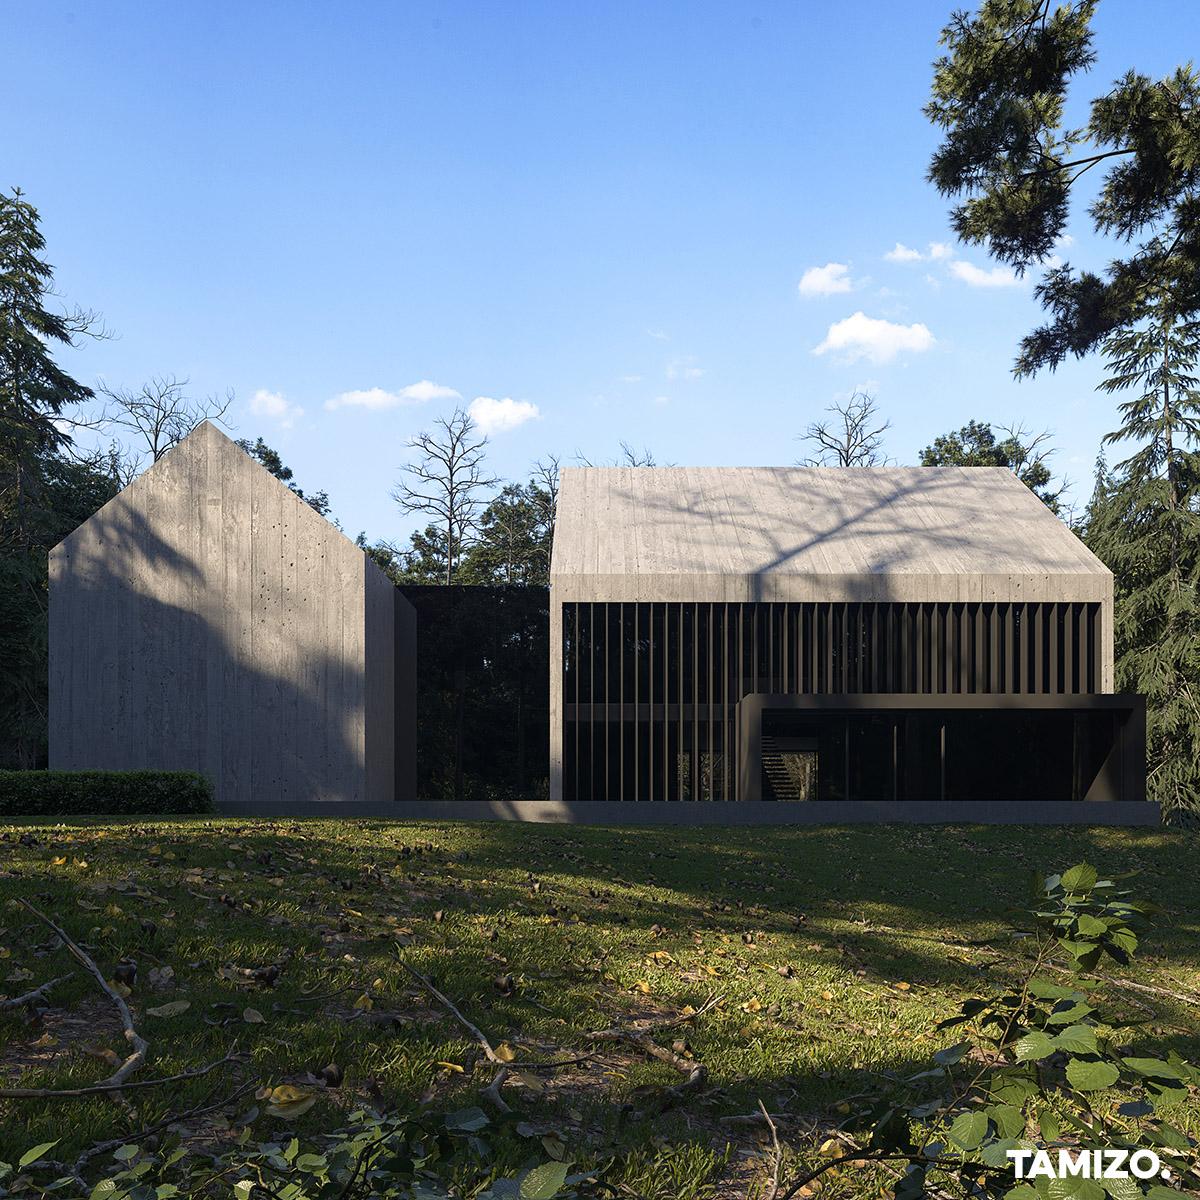 A094_tamizo_villa_architekci_newyork_ny_burrfarms_connecticut_rezydencja_house_residence_02